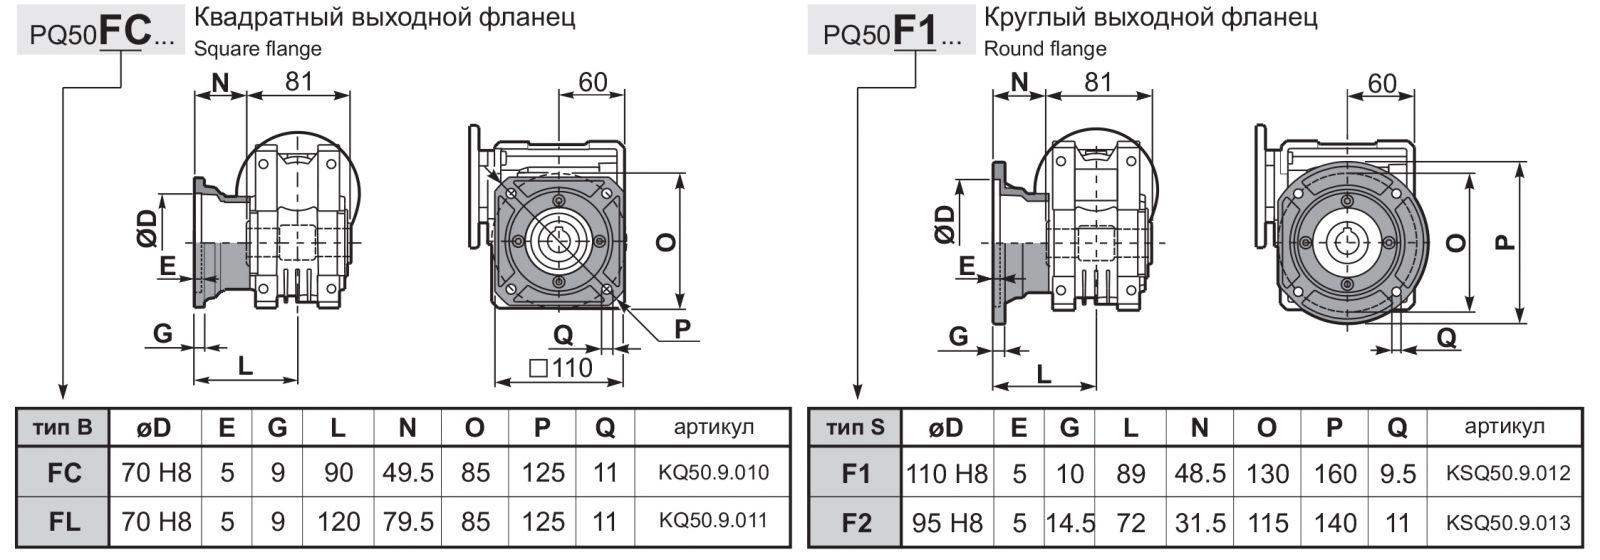 Чертеж редуктора Q 50 innovari фланцы